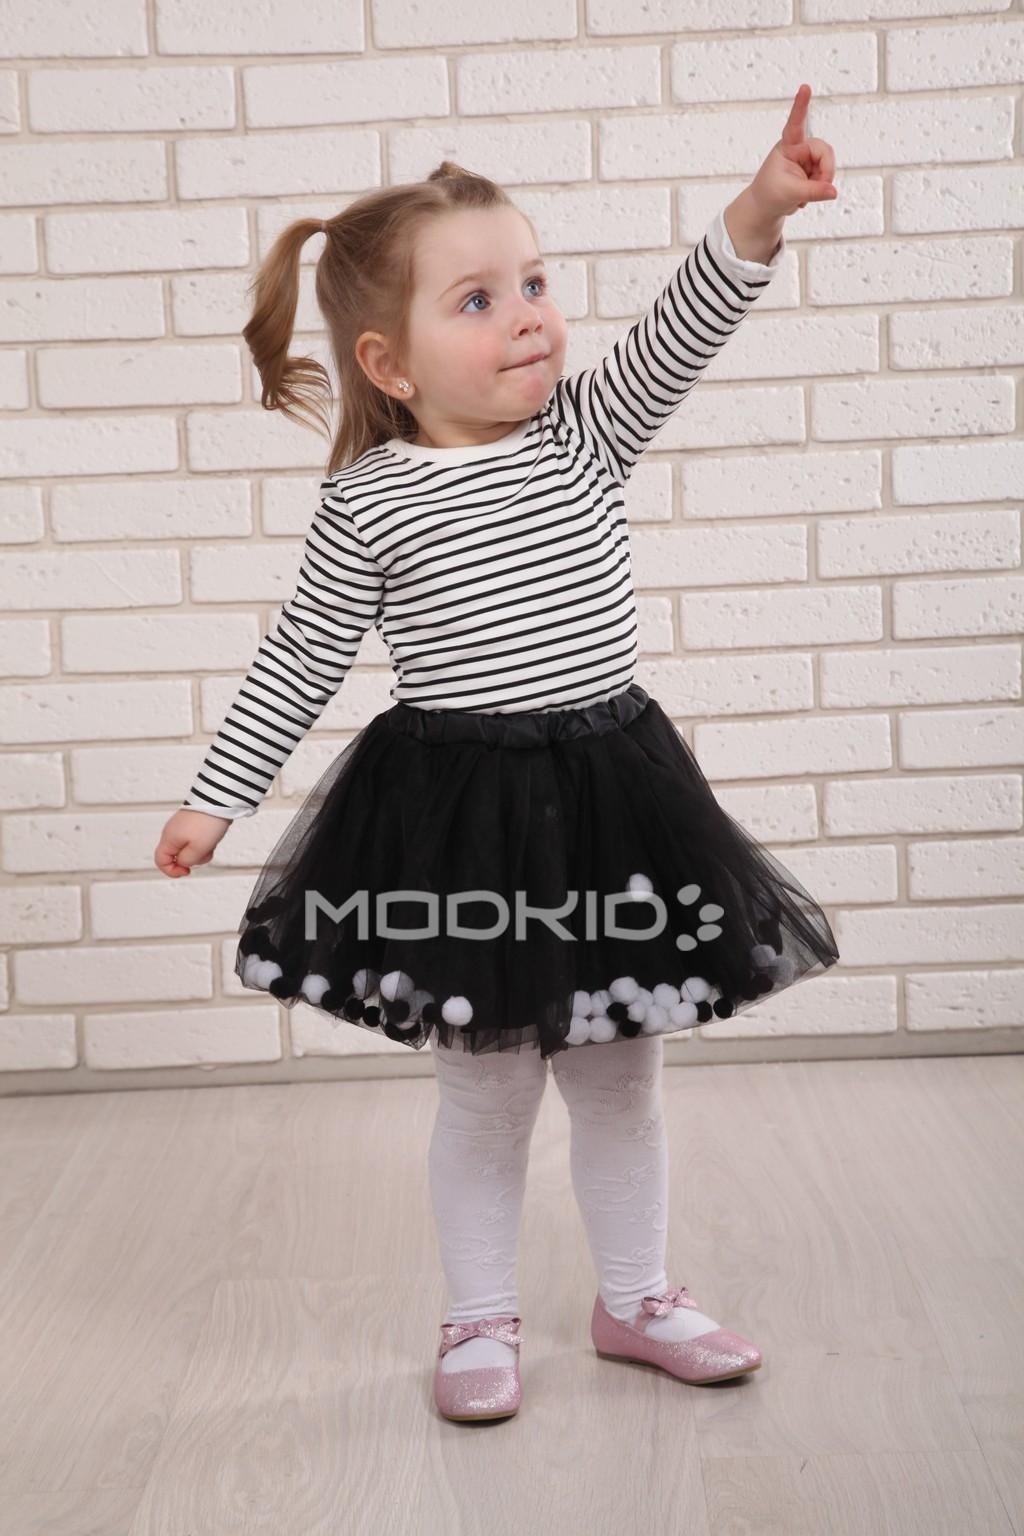 https://modkid.com.ua/images/stories/virtuemart/product/IMG_04501.jpg